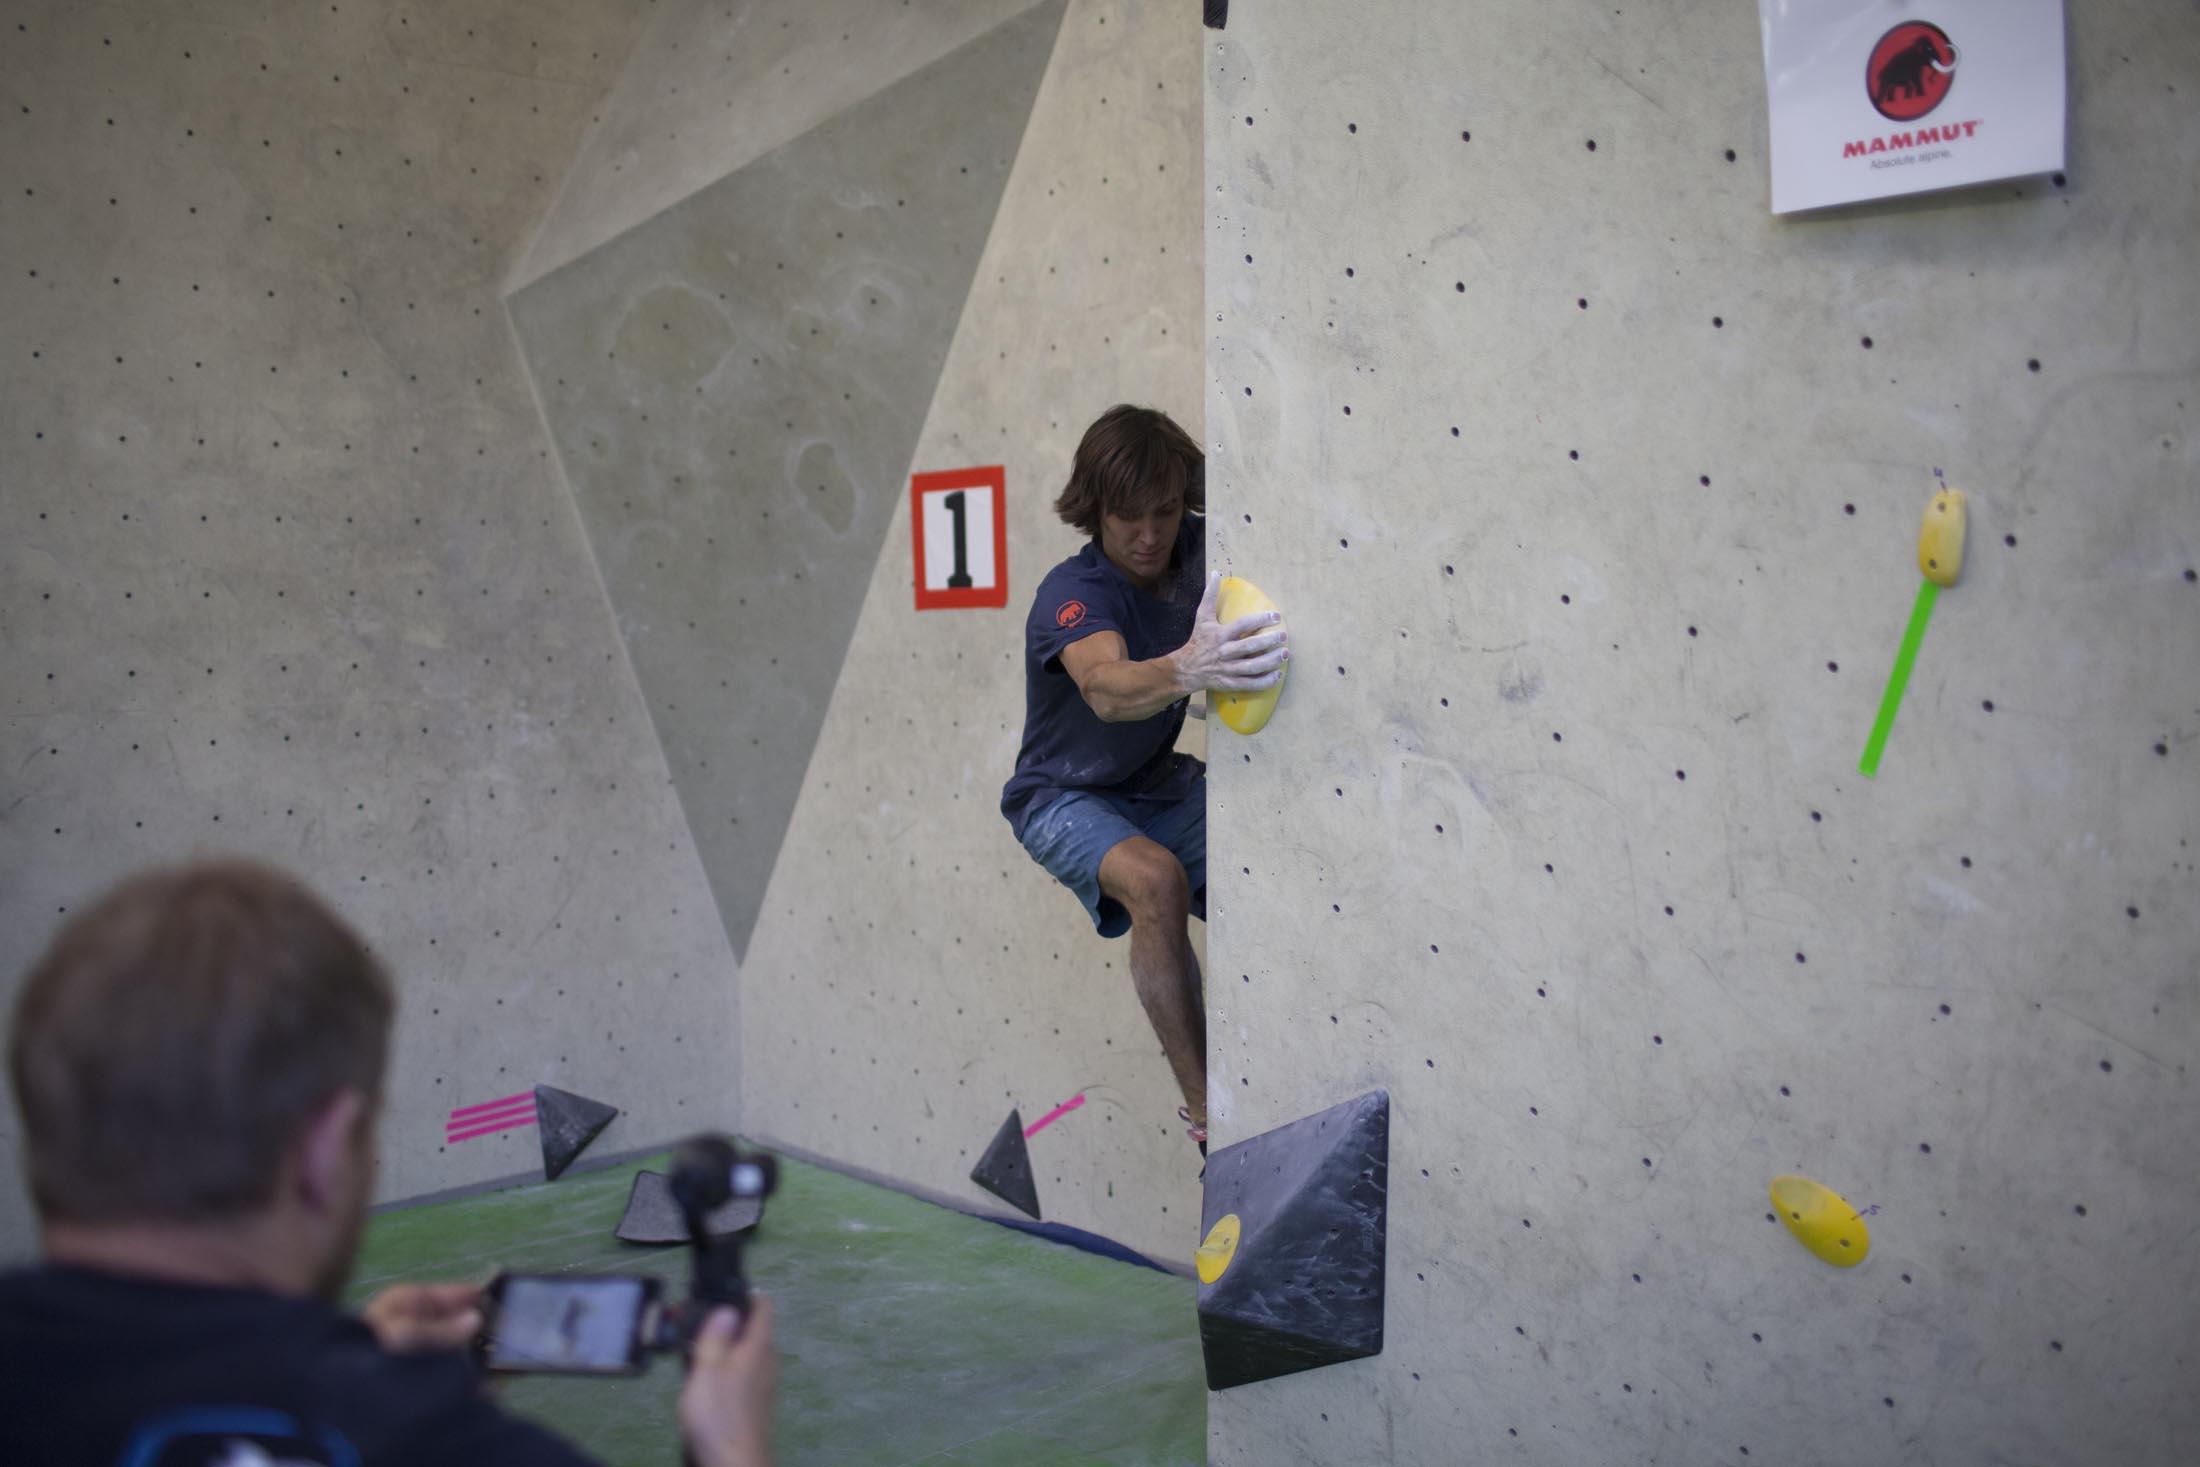 Finale, internationaler bouldercup Frankenjura 2016, BLOCKHELDEN Erlangen, Mammut, Bergfreunde.de, Boulderwettkampf07092016489